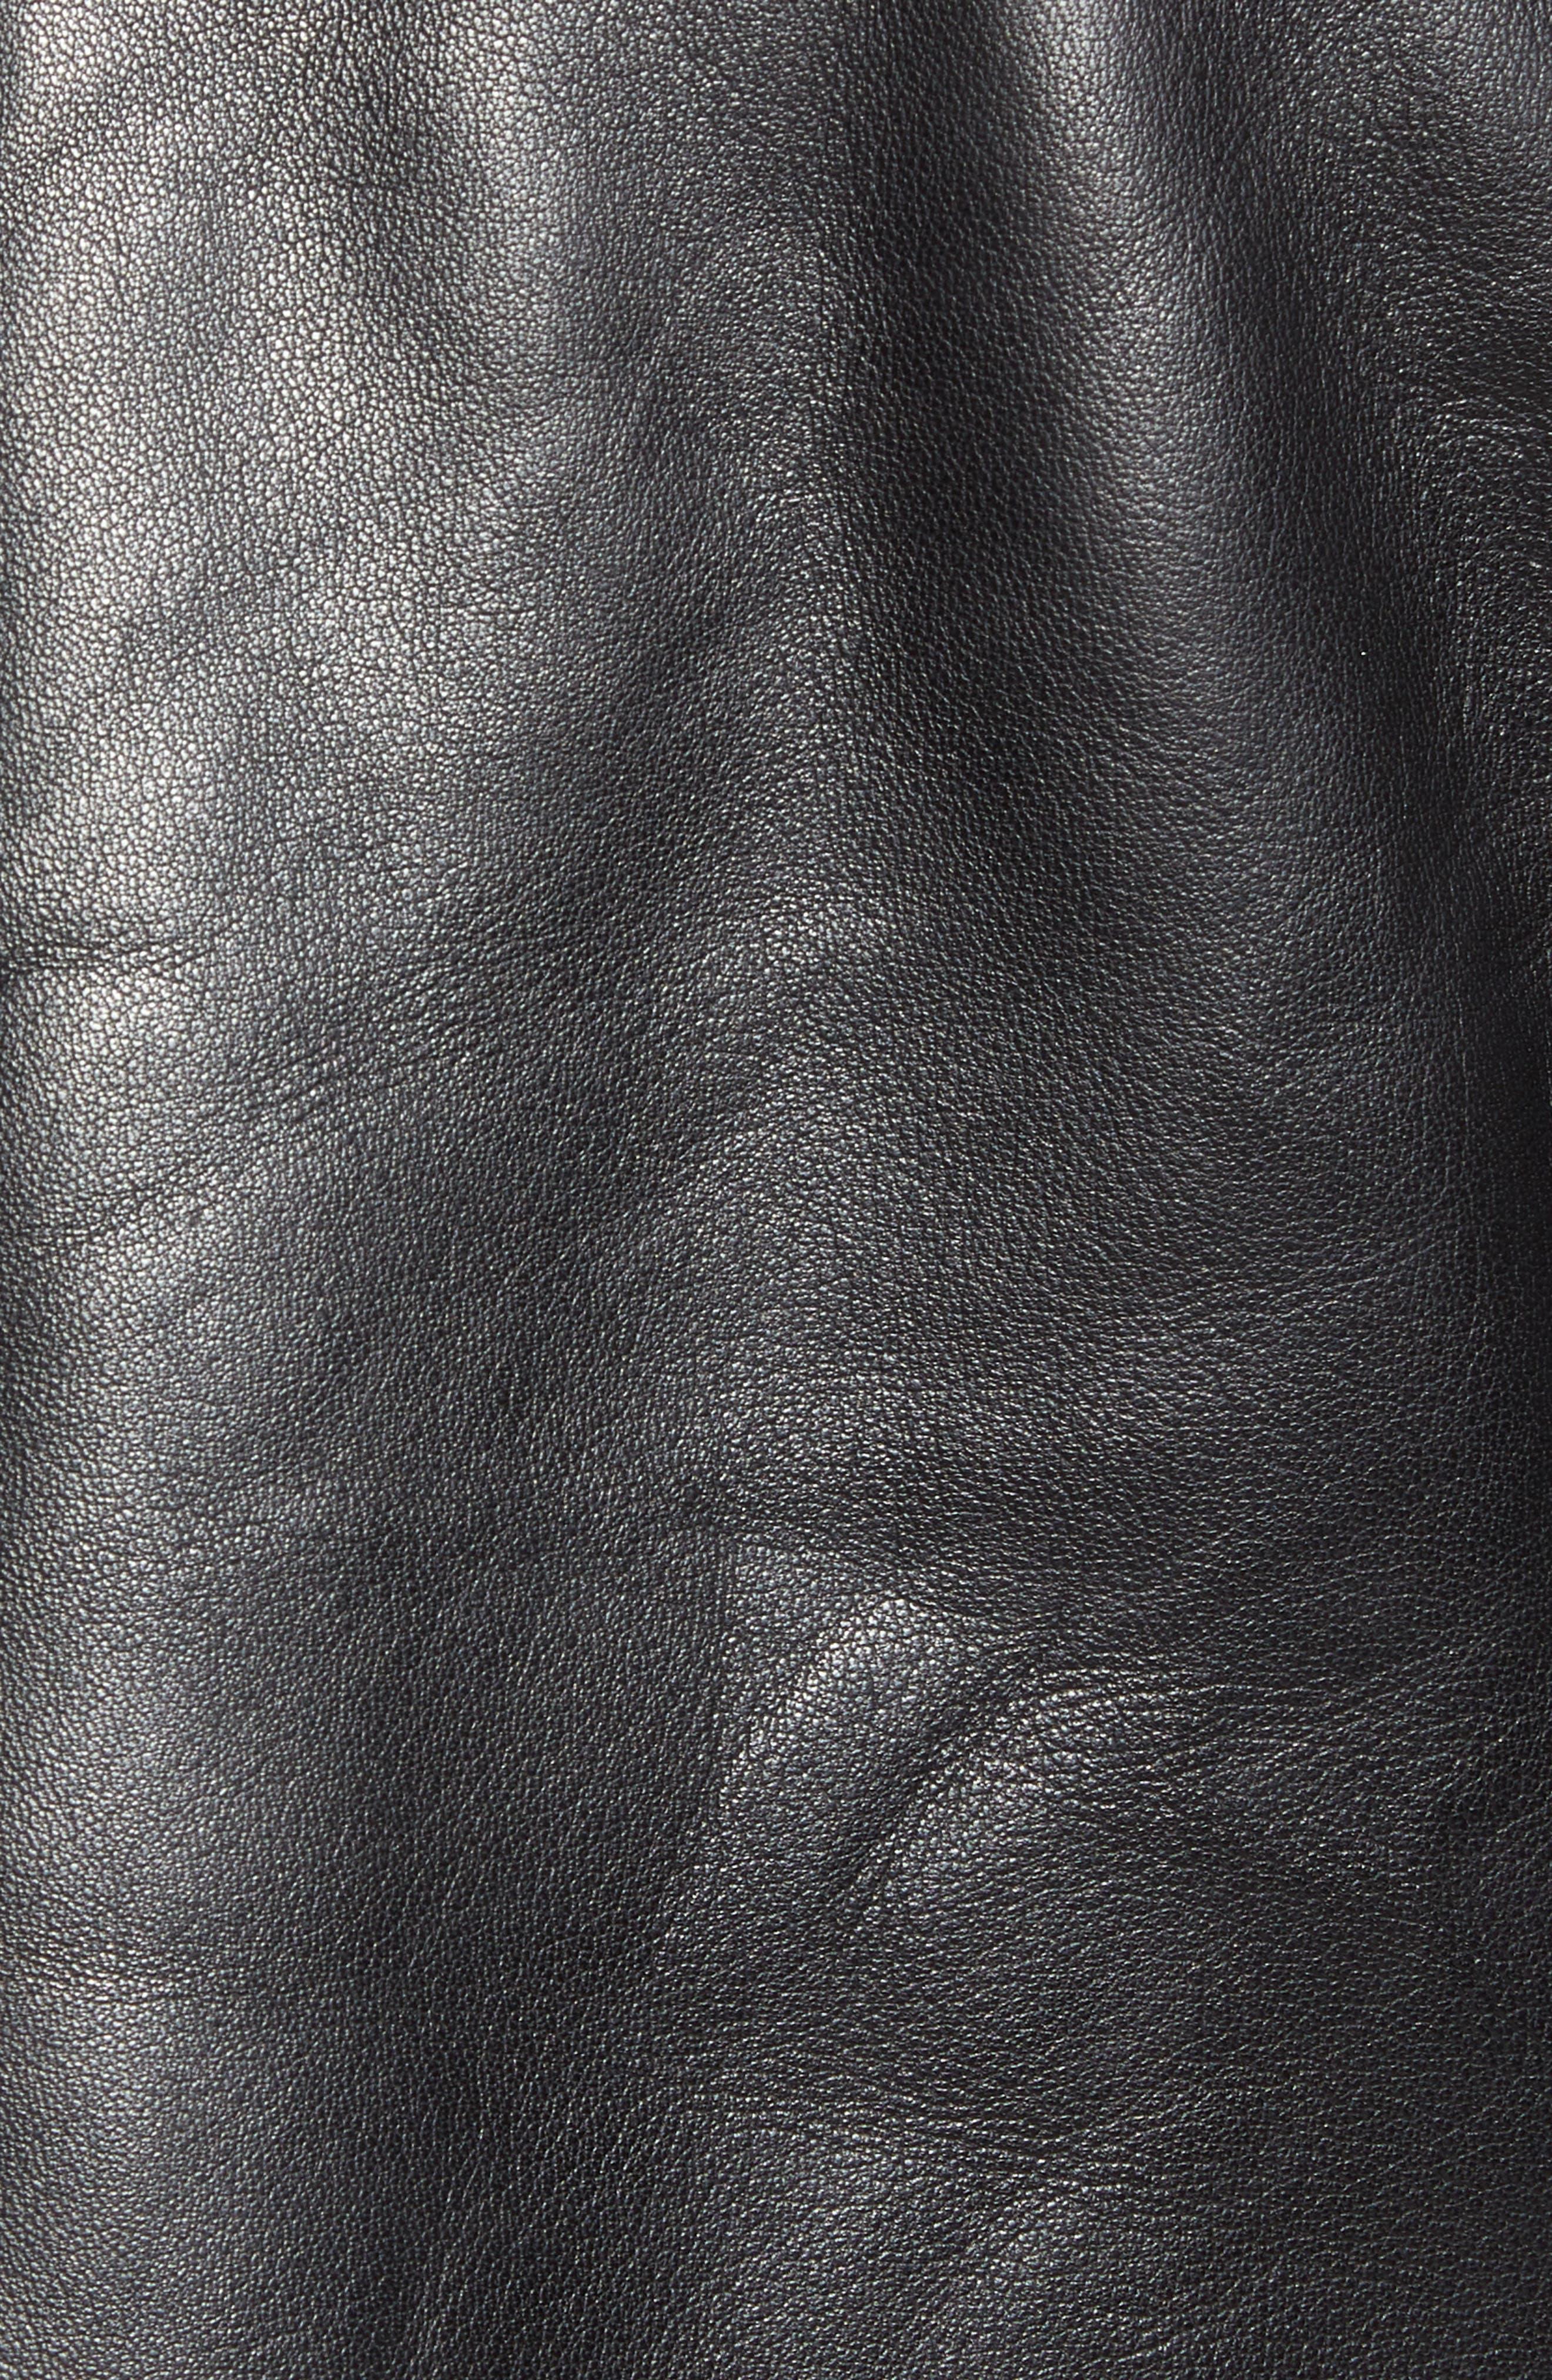 Arinos Leather Bomber Jacket,                             Alternate thumbnail 6, color,                             BLACK